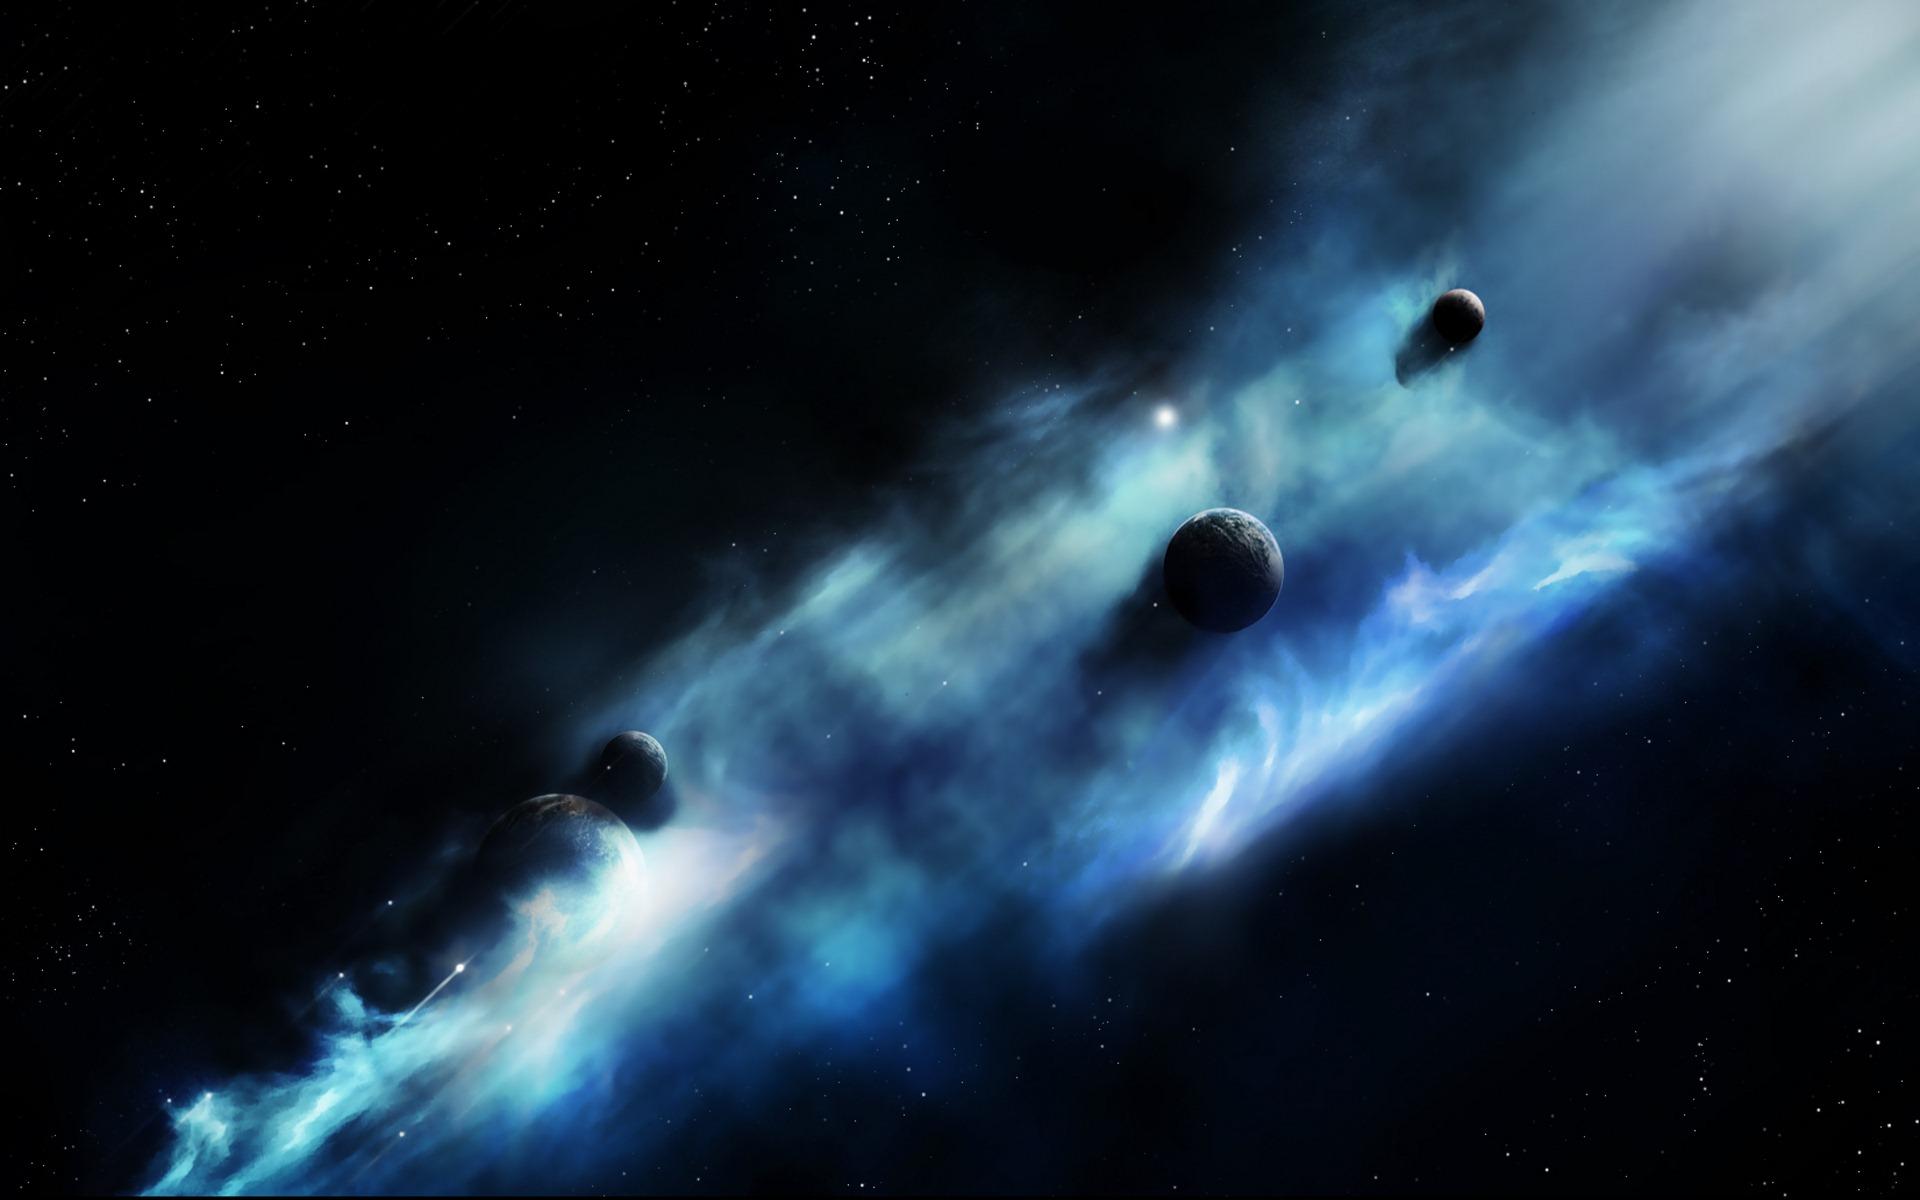 Blue Space Clouds